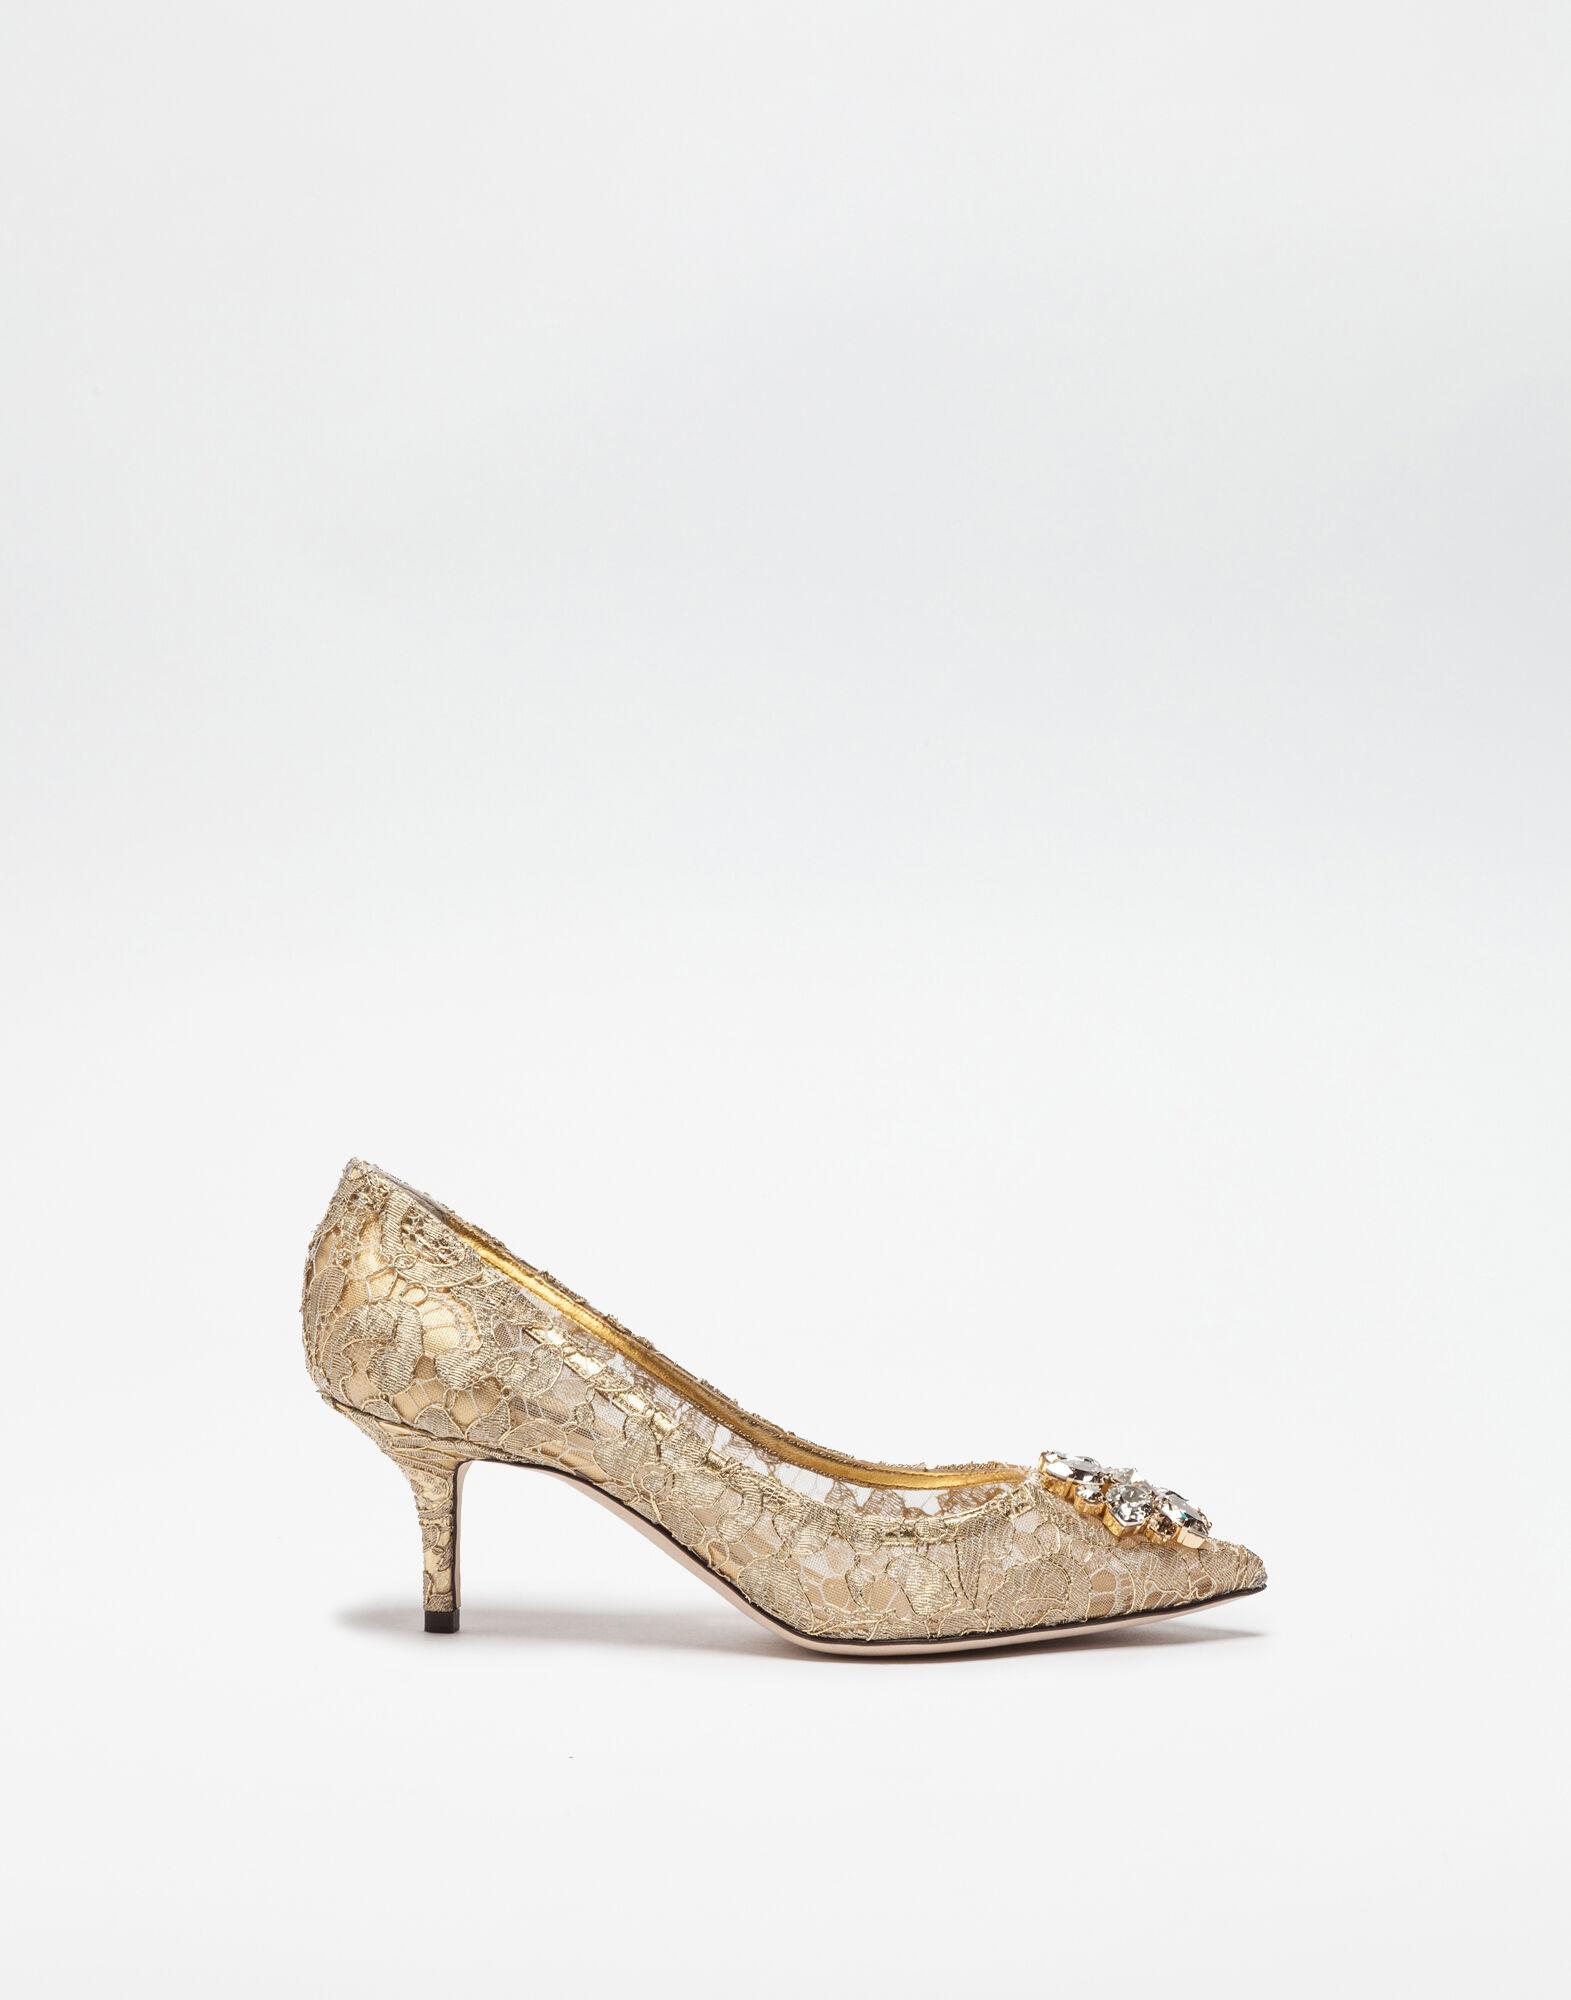 Dolce & Gabbana Woman Crystal-embellished Corded Lace Slides Coral Size 35.5 Dolce & Gabbana yhVWihuvR